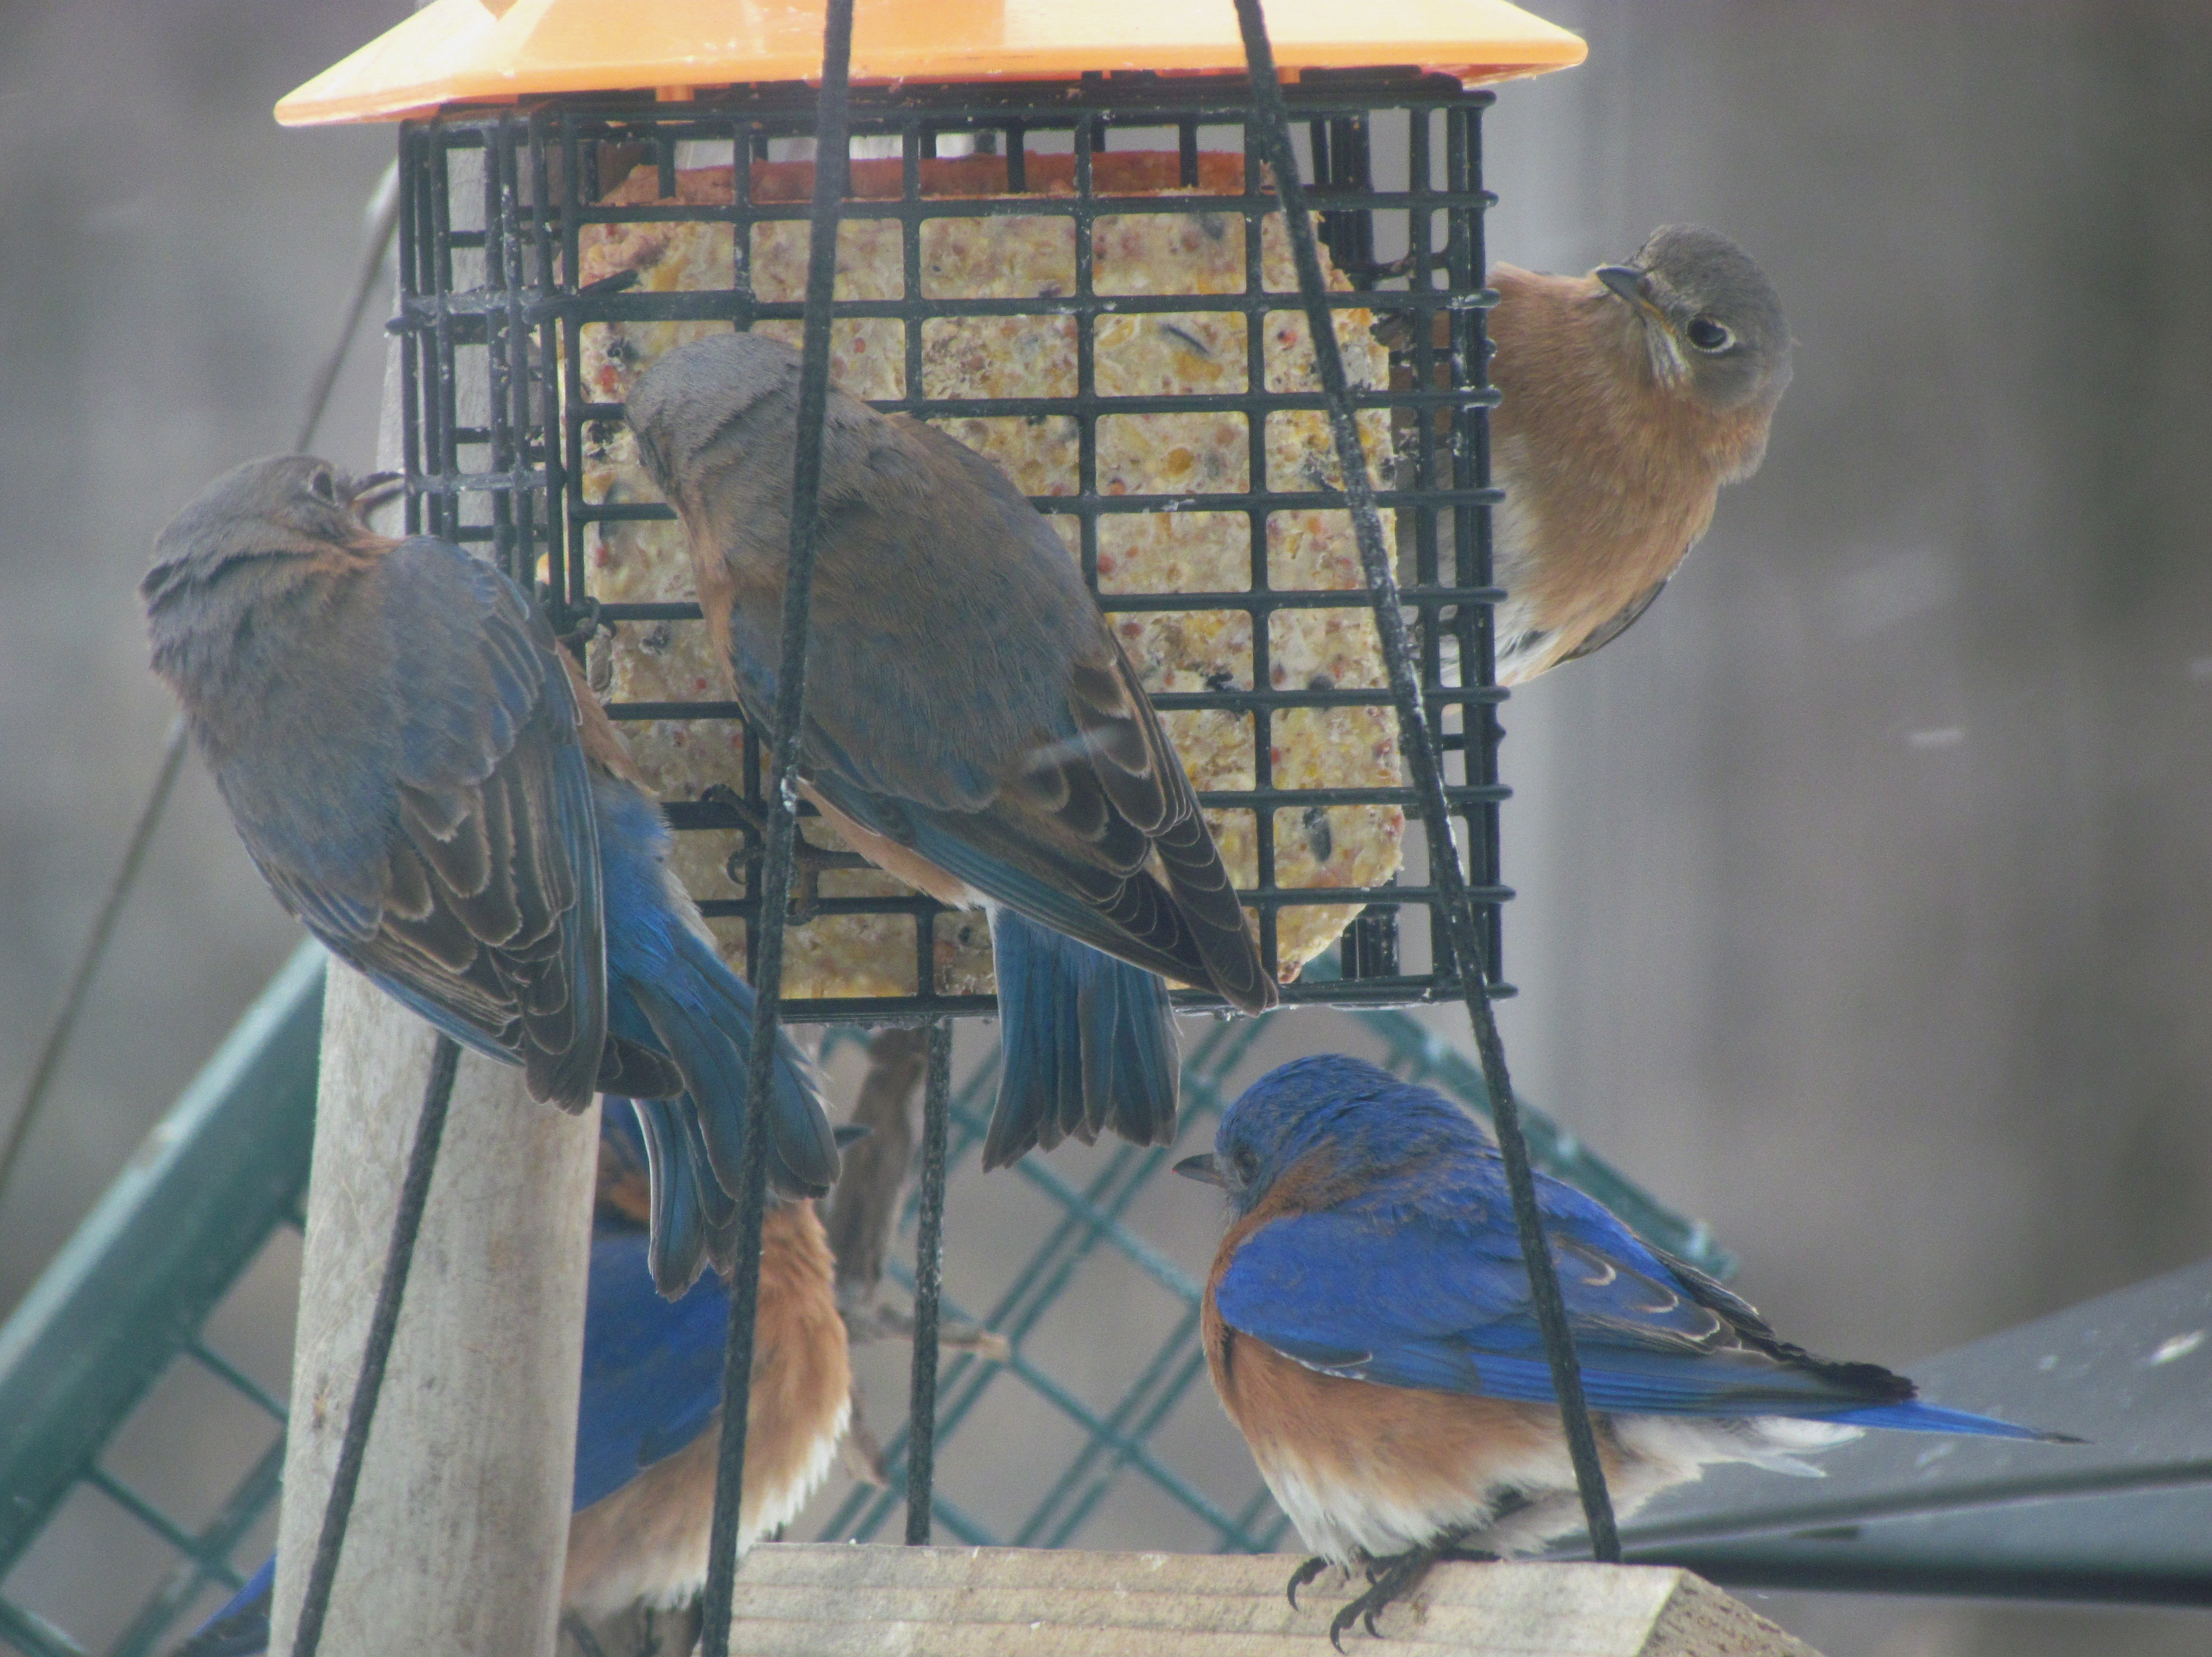 songbird feeder bluebird bird house blue copper window essentials mealworm feeders